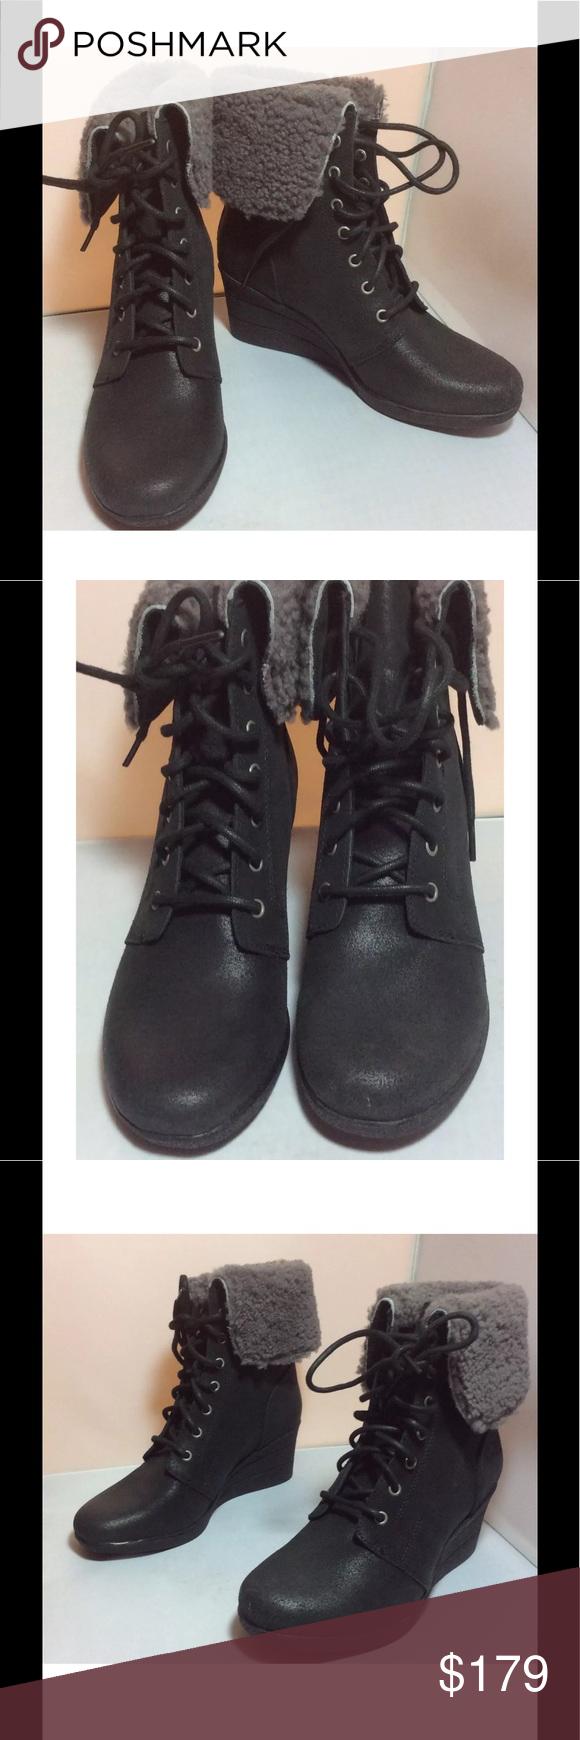 78343b18f01d NIB UGG Zea Waterproof Shearling Wedge Boot Size 7 NIB UGG Australia Women s  Zea Waterproof Genuine